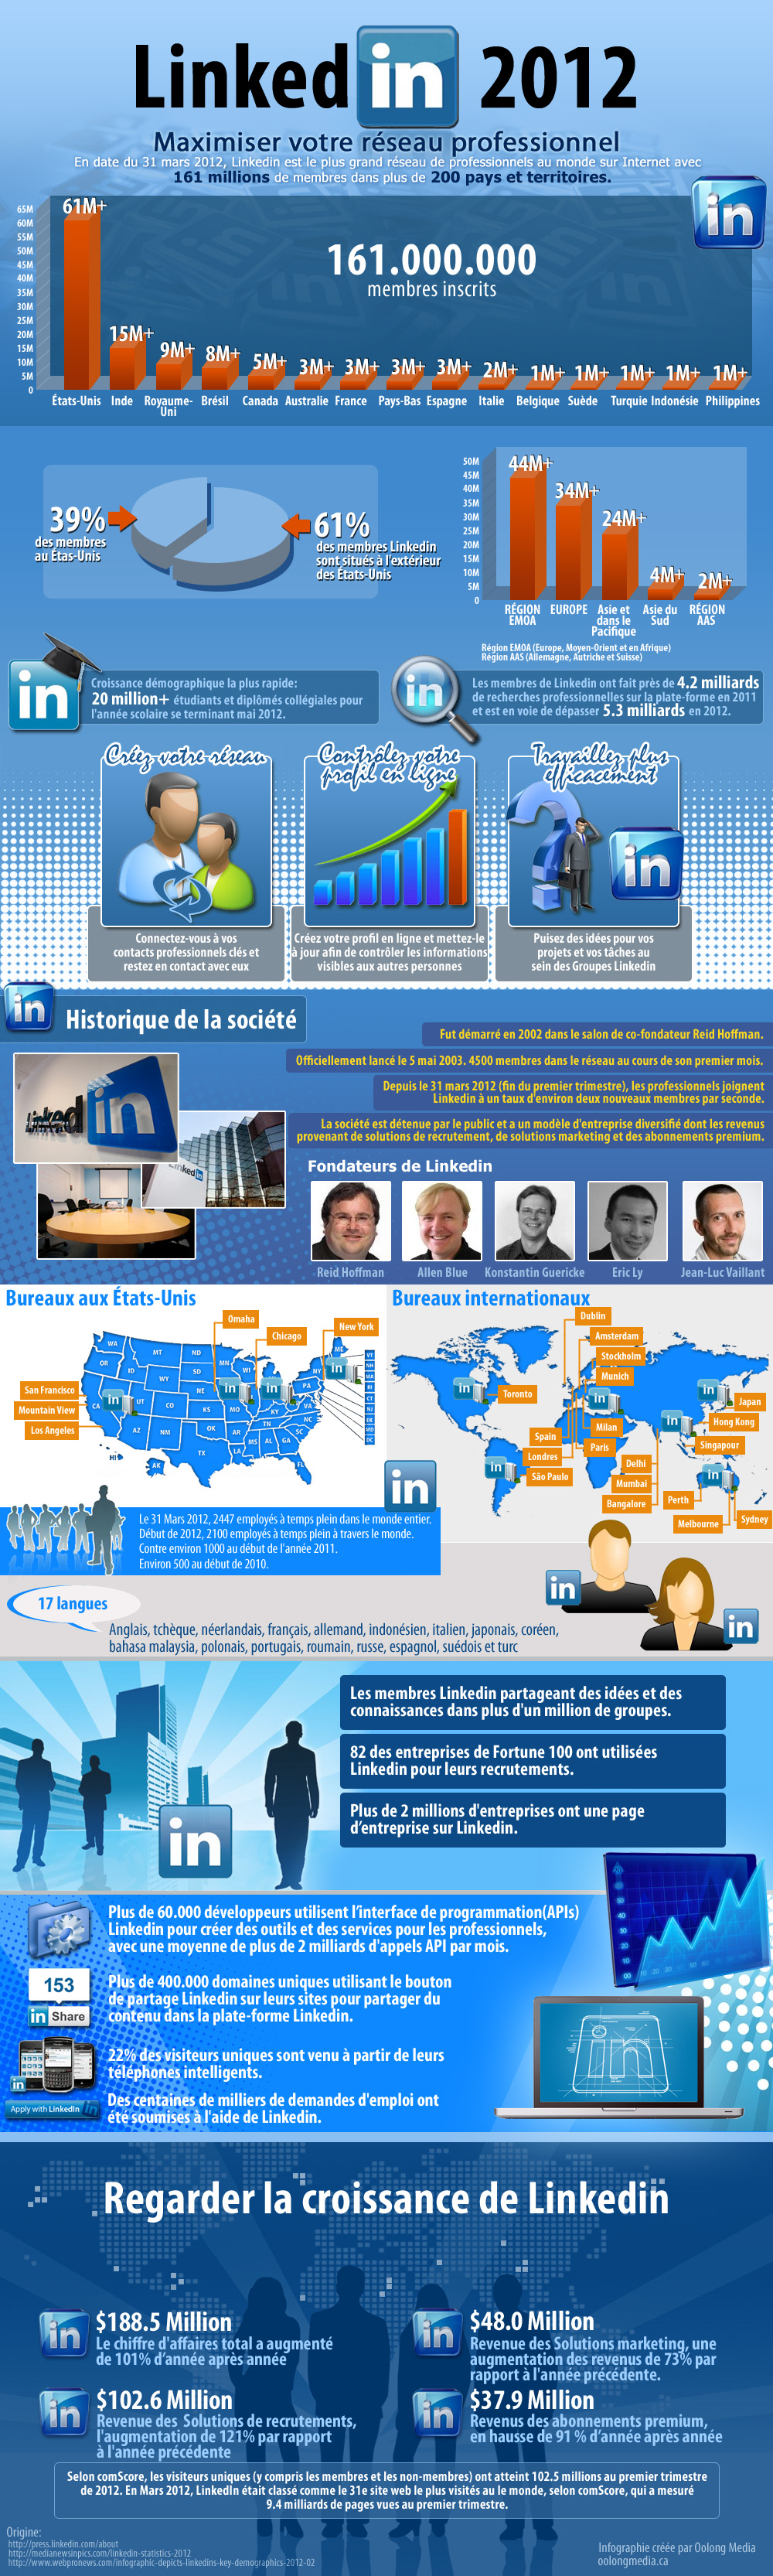 Infographique Linkedin 2012